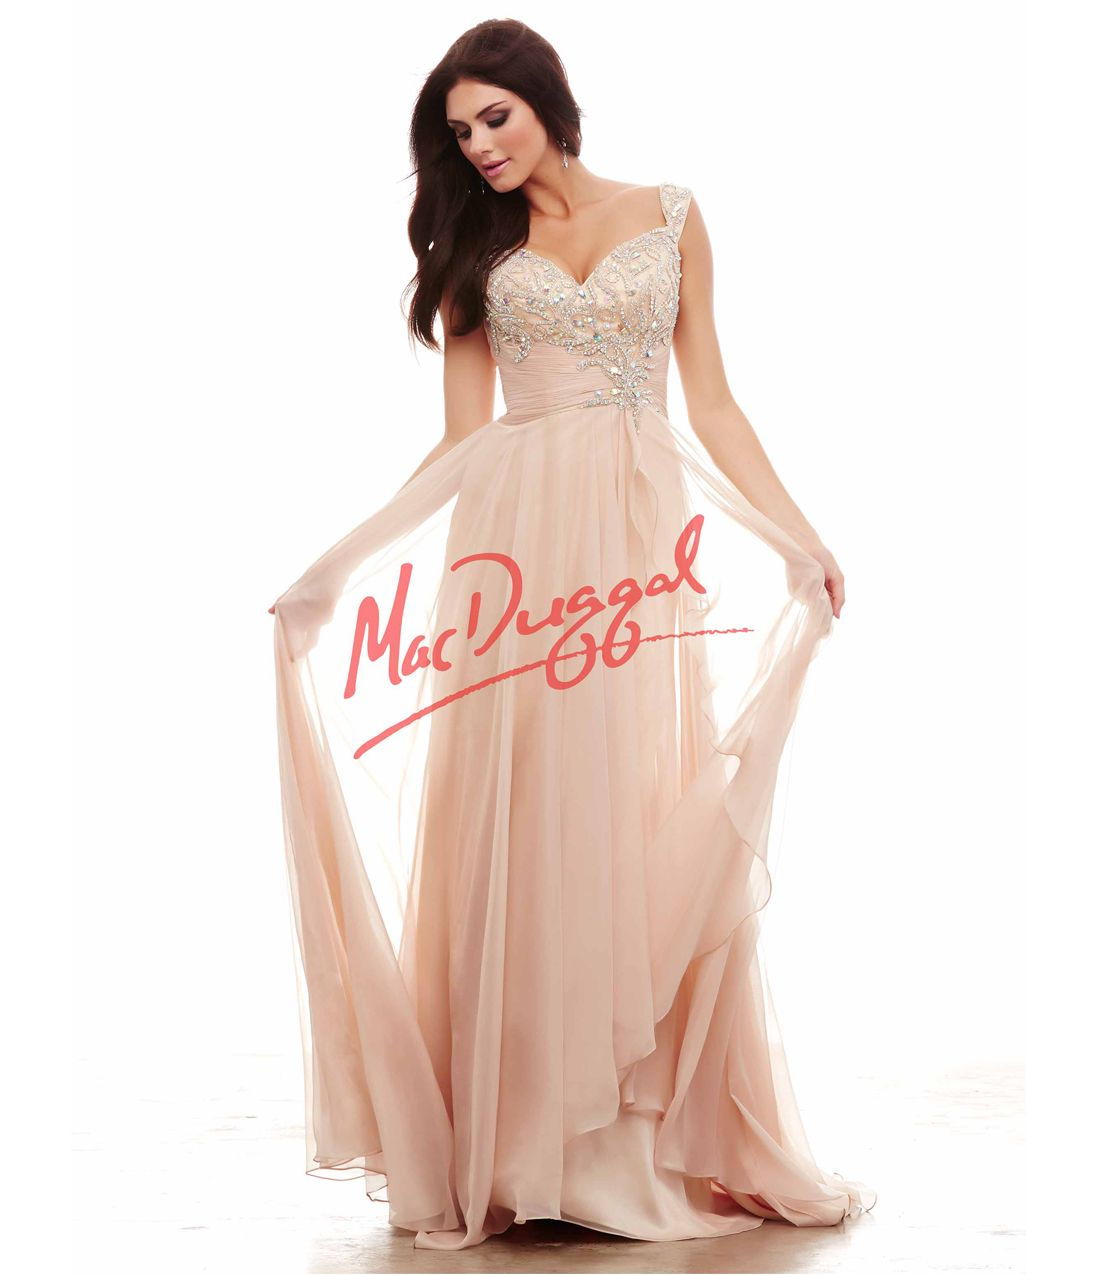 1940 S Style Prom Dresses Formal Dresses Evening Gowns Prom Dresses Vintage Mac Duggal Prom Dresses Prom Dresses [ 1275 x 1095 Pixel ]